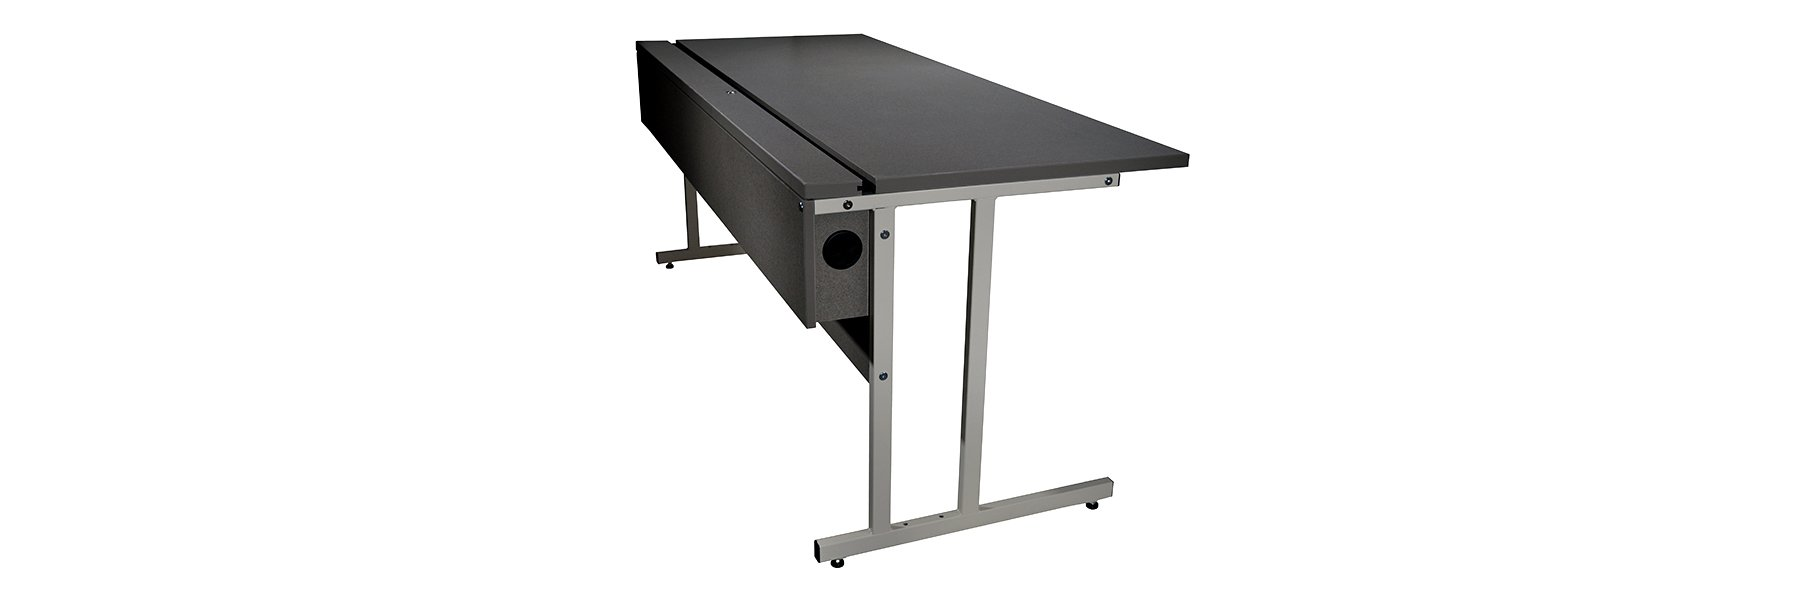 Corilam 8000T Metal Base Desk